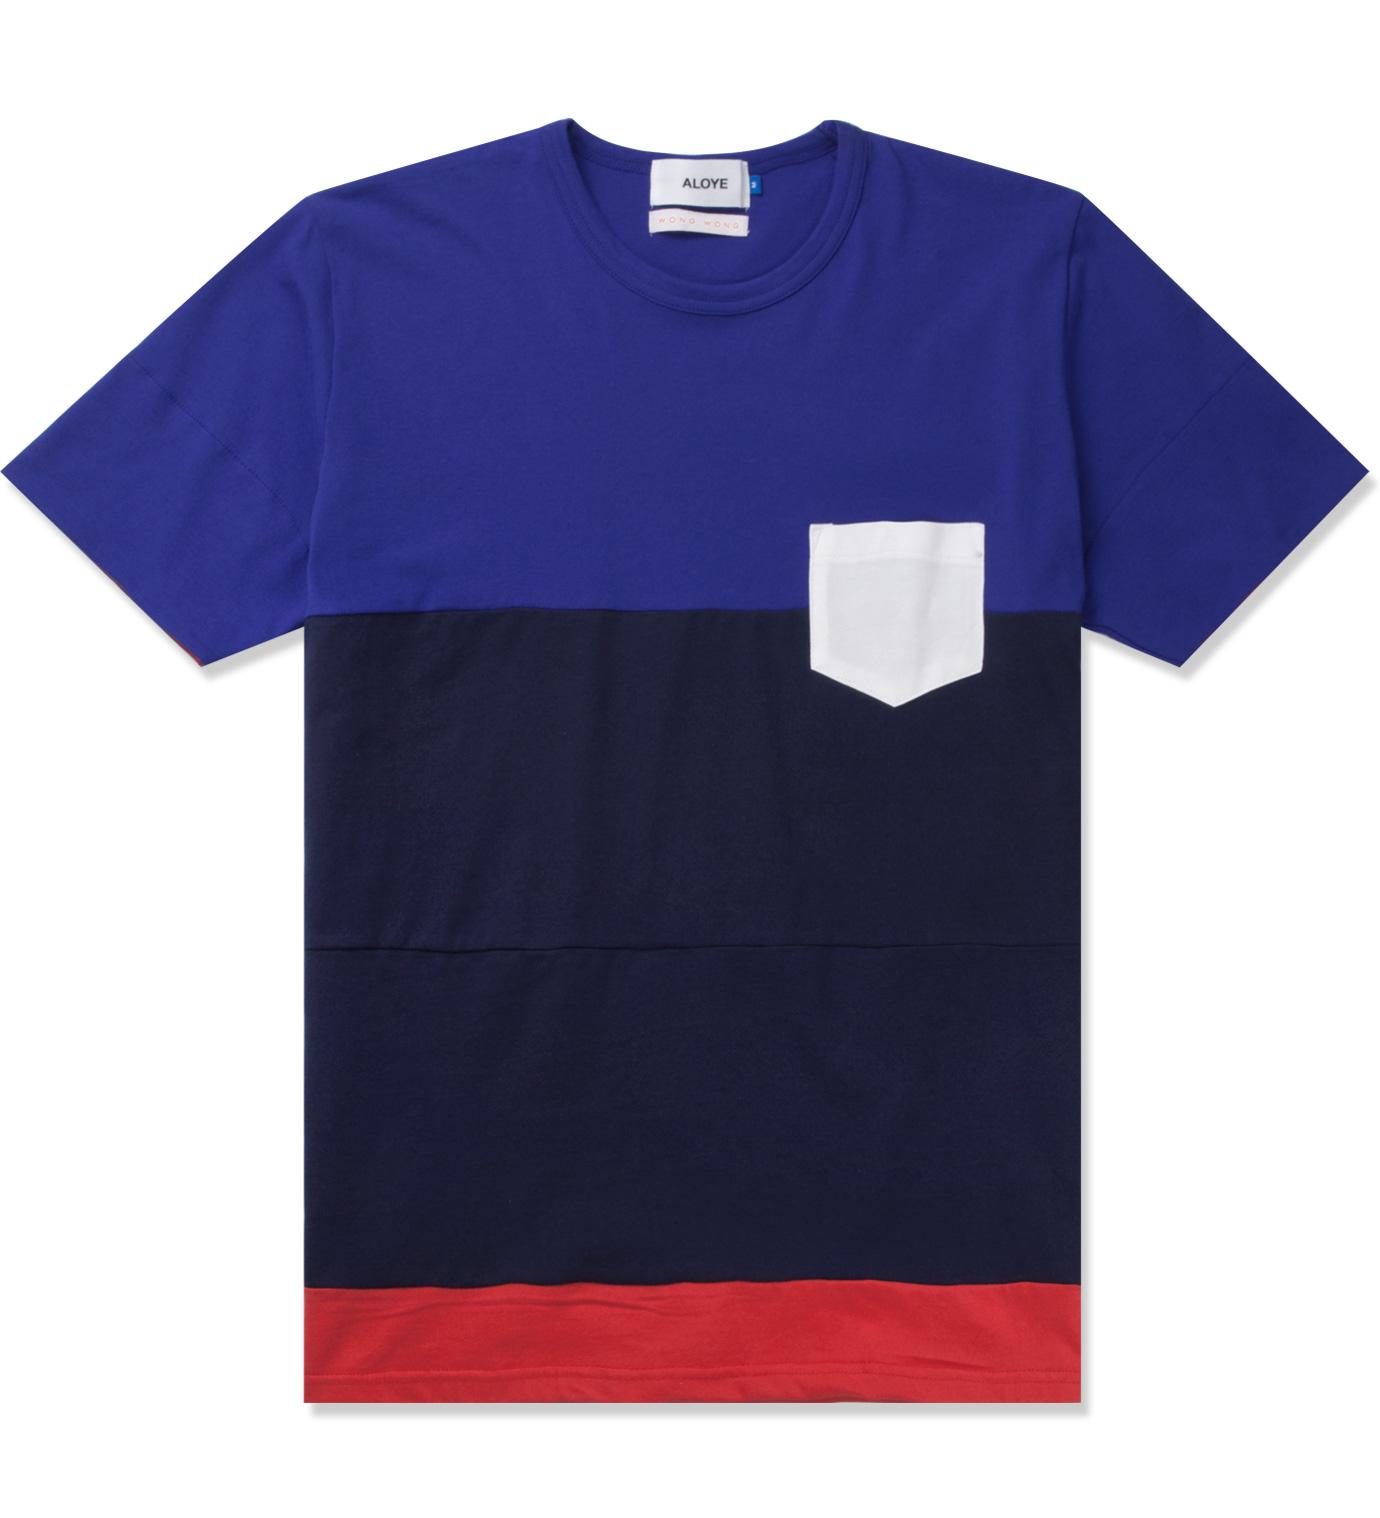 Aloye aloye x wong wong blue navy blue japan color blocked for Navy blue color shirt